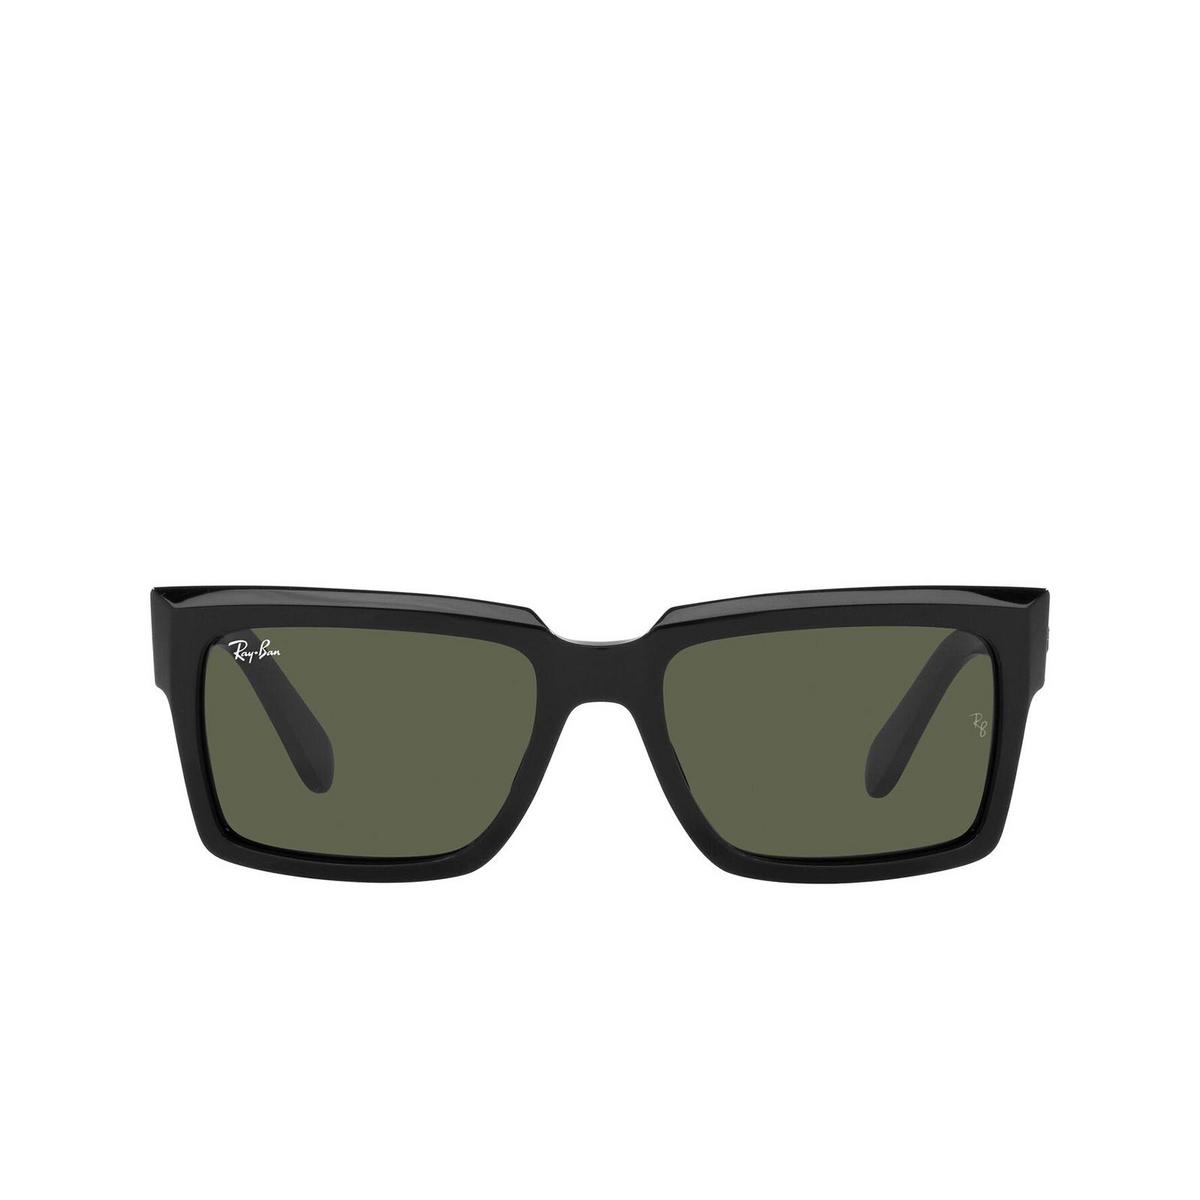 Ray-Ban® Square Sunglasses: Inverness RB2191 color Black 901/31.